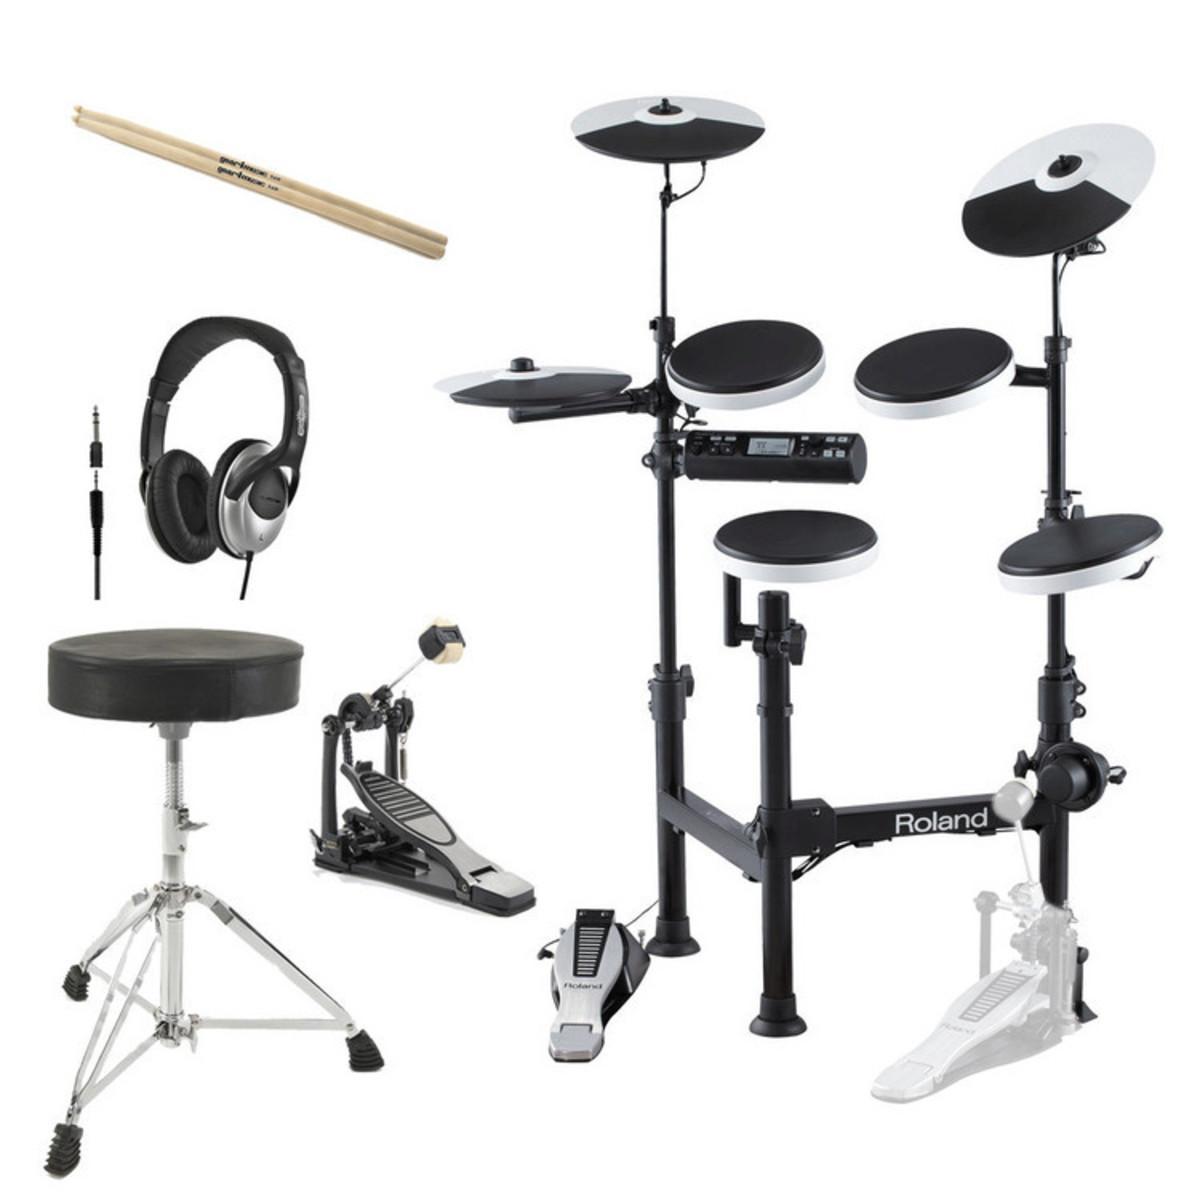 Roland TD-4KP V-Drums Portable Electronic Drum Kit